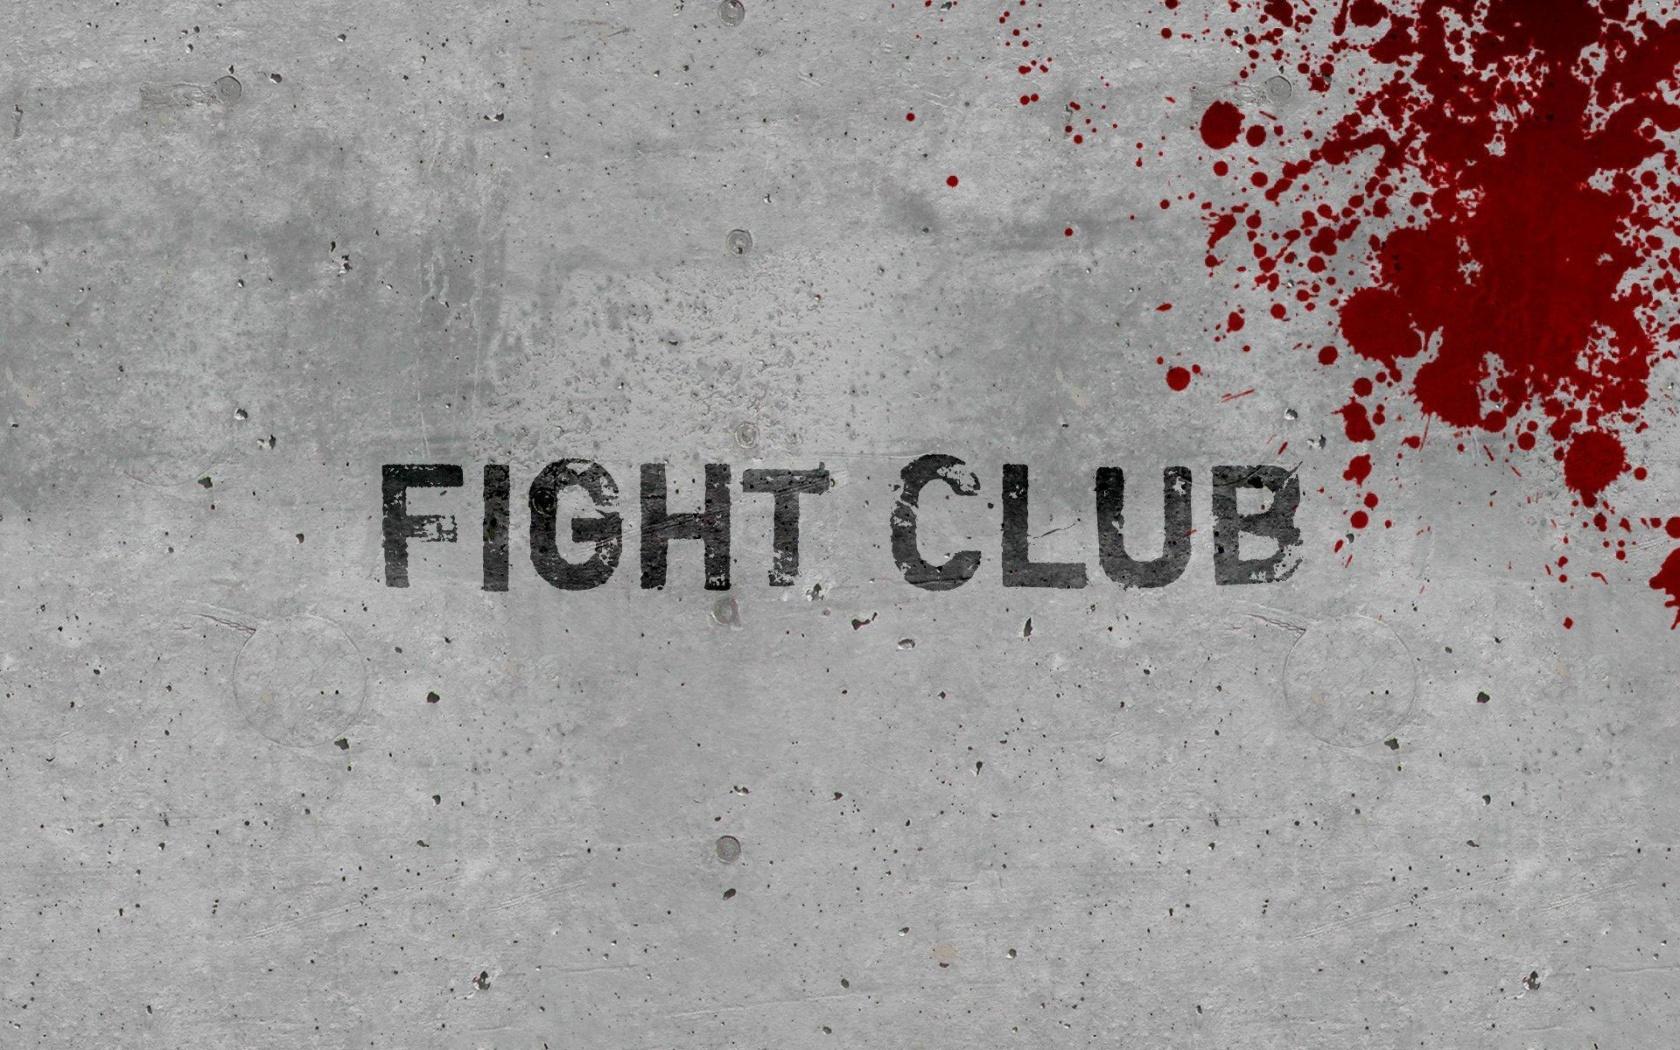 Fight Club Computer Wallpapers Desktop Backgrounds 1680x1050